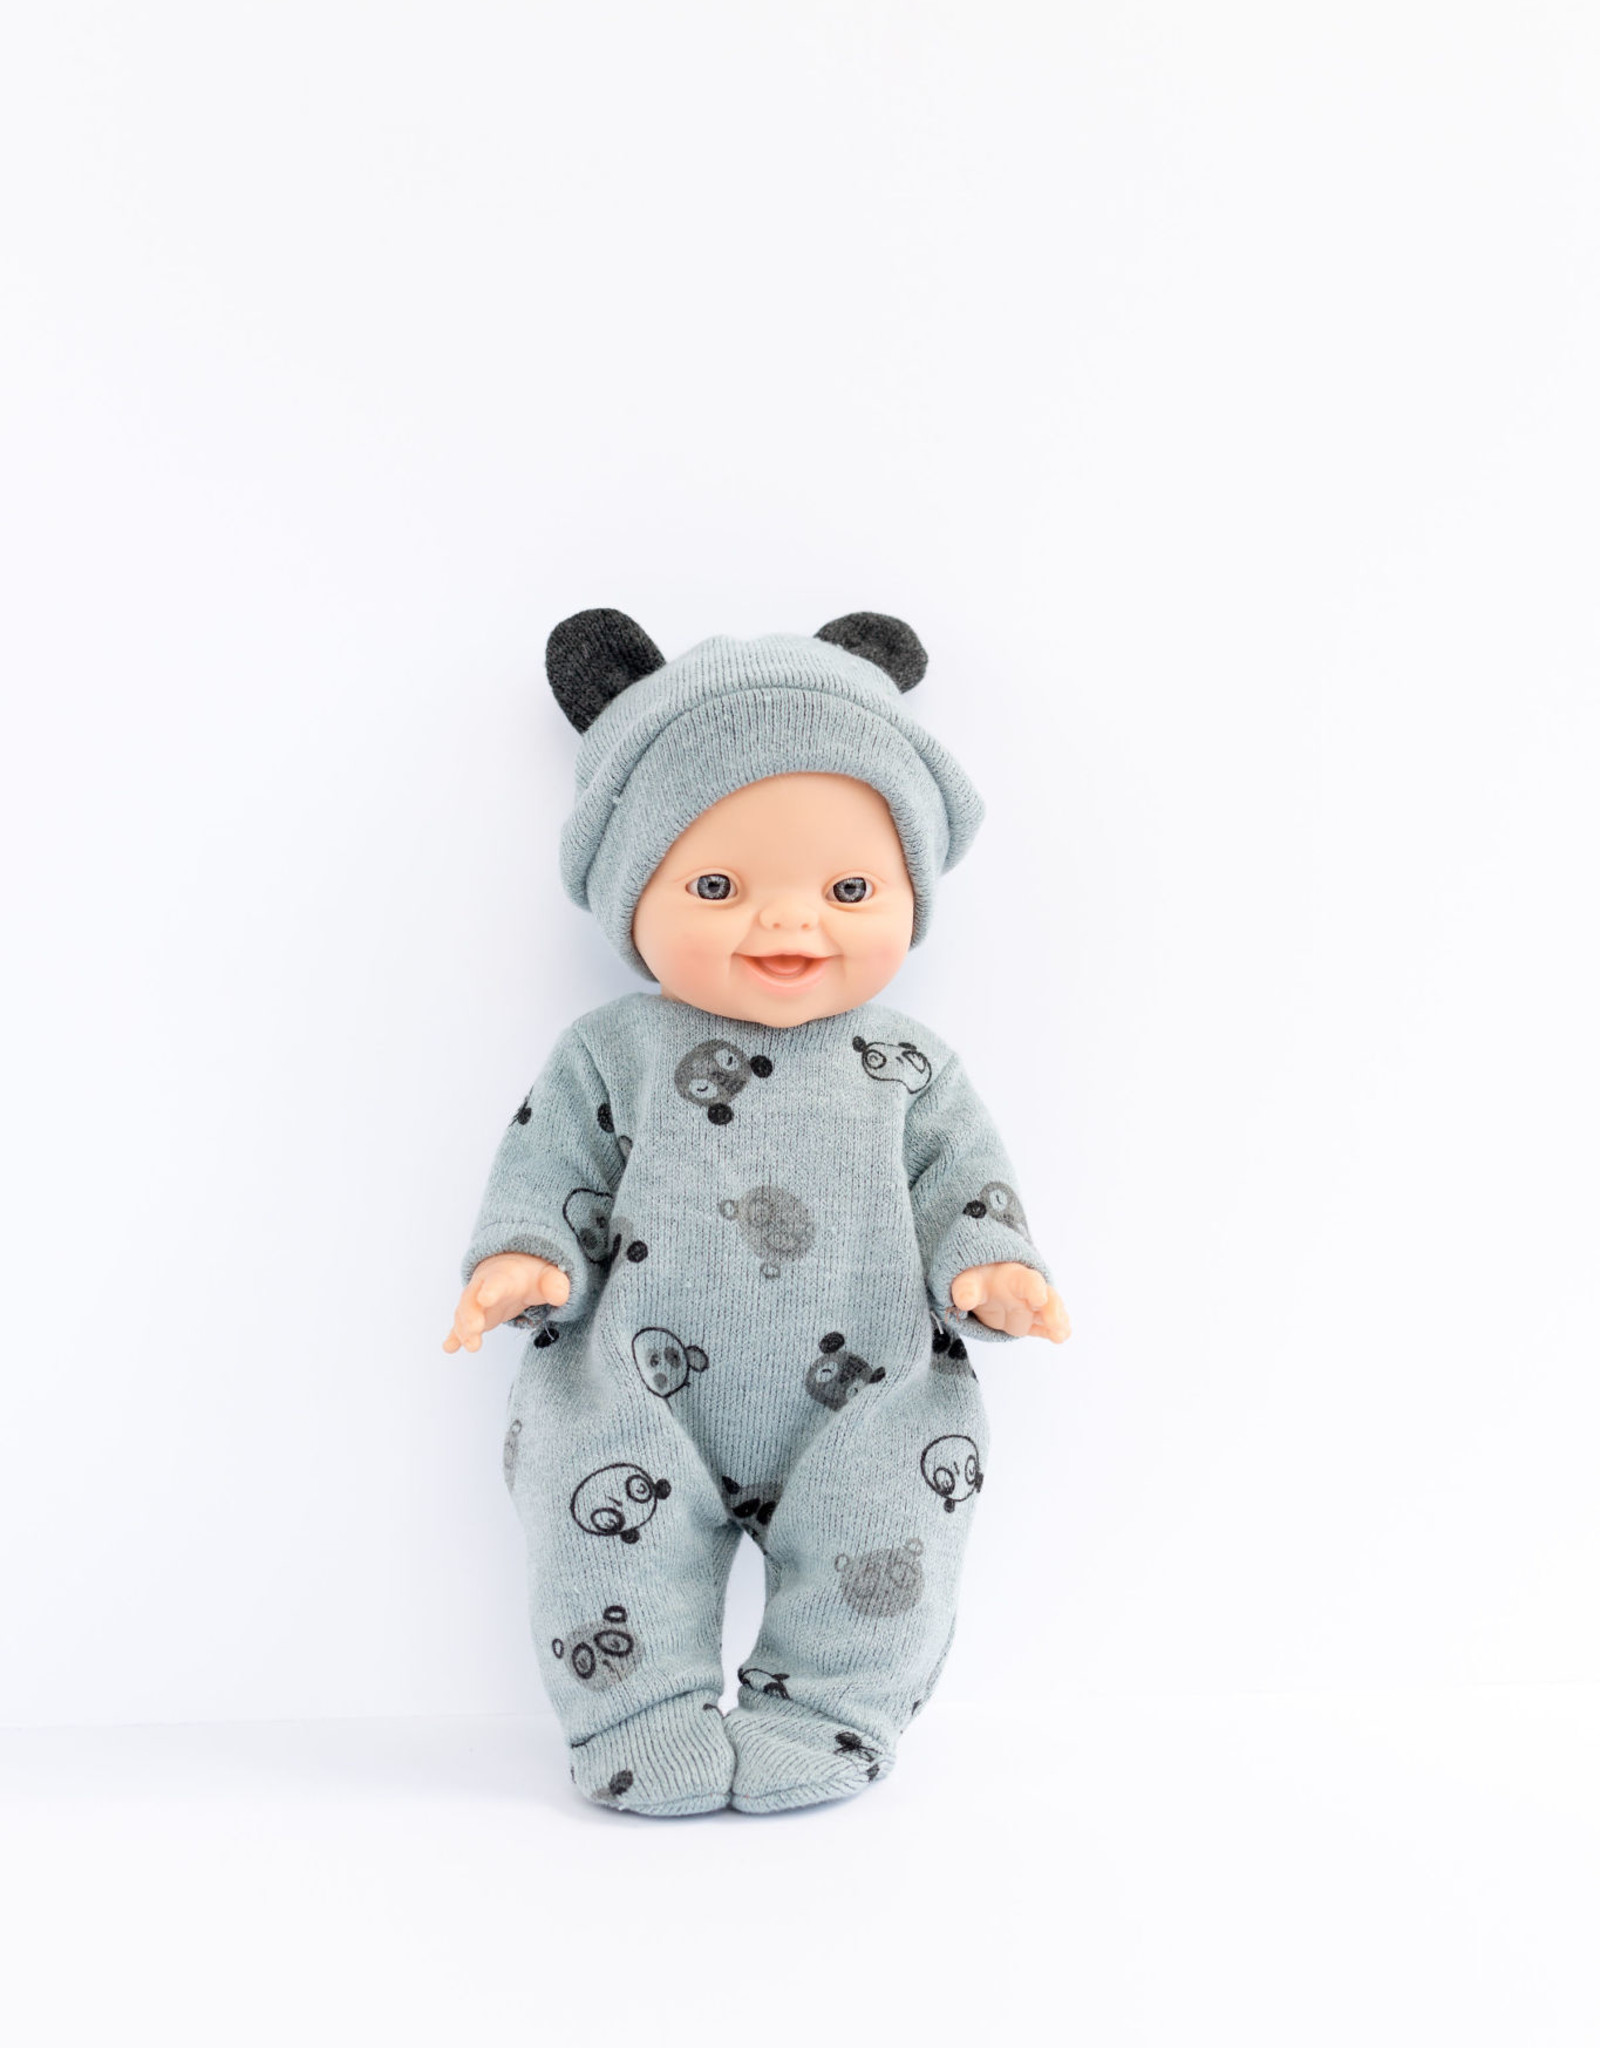 Paola Reina Doll clothes - Gray Teddy Bear Pajamas and Hat